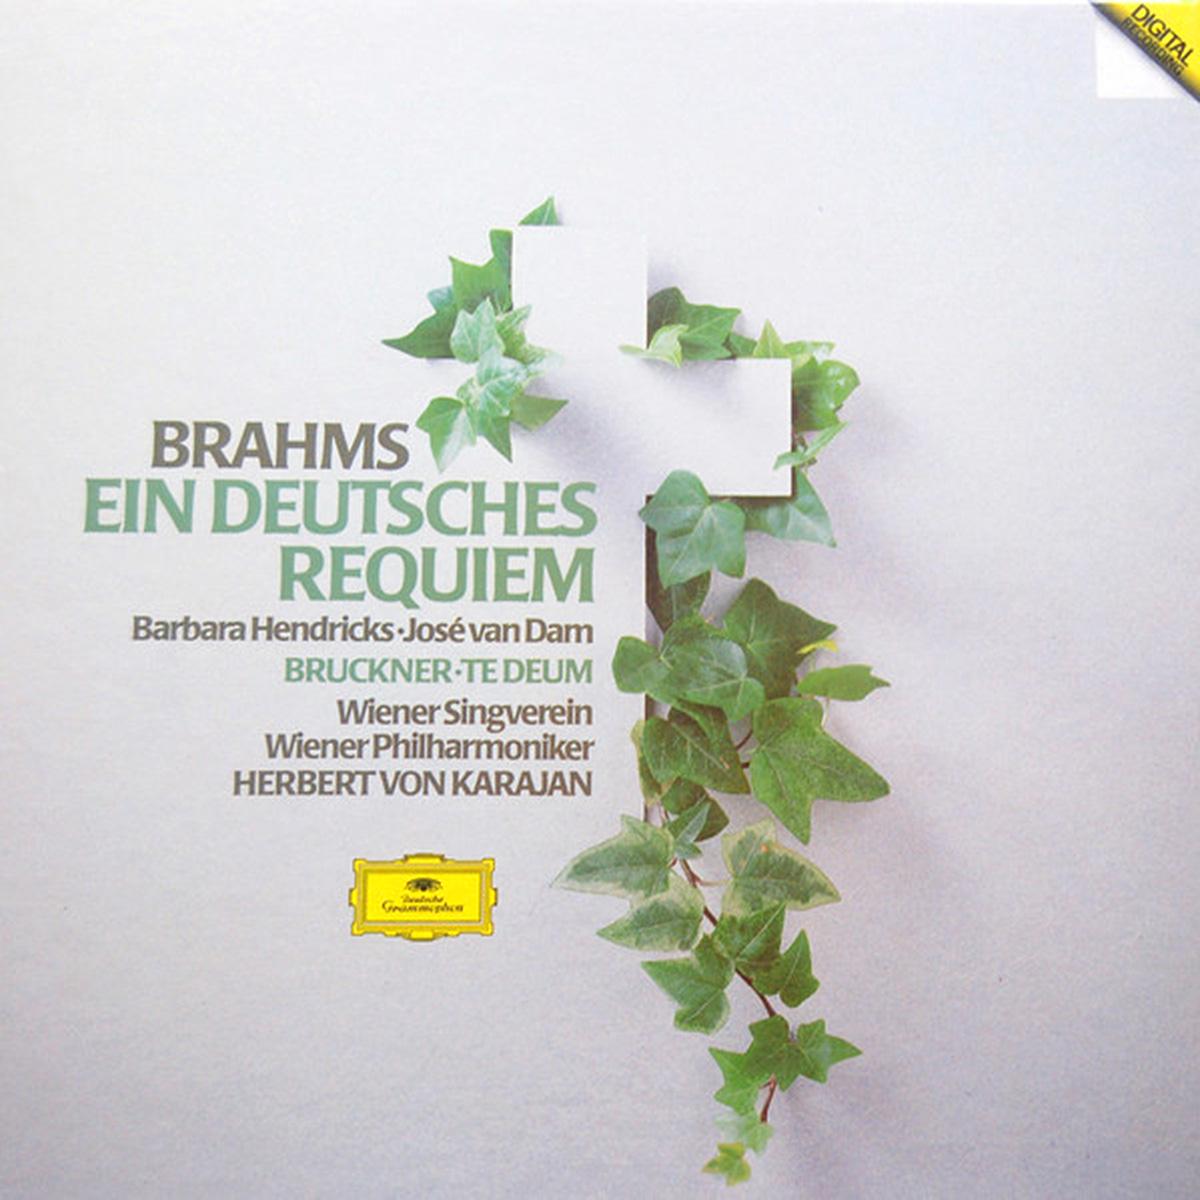 DGG 410 521 Brahms Deutsche Requiem Bruckner Te Deum Karajan DGG Digital Aufnahme